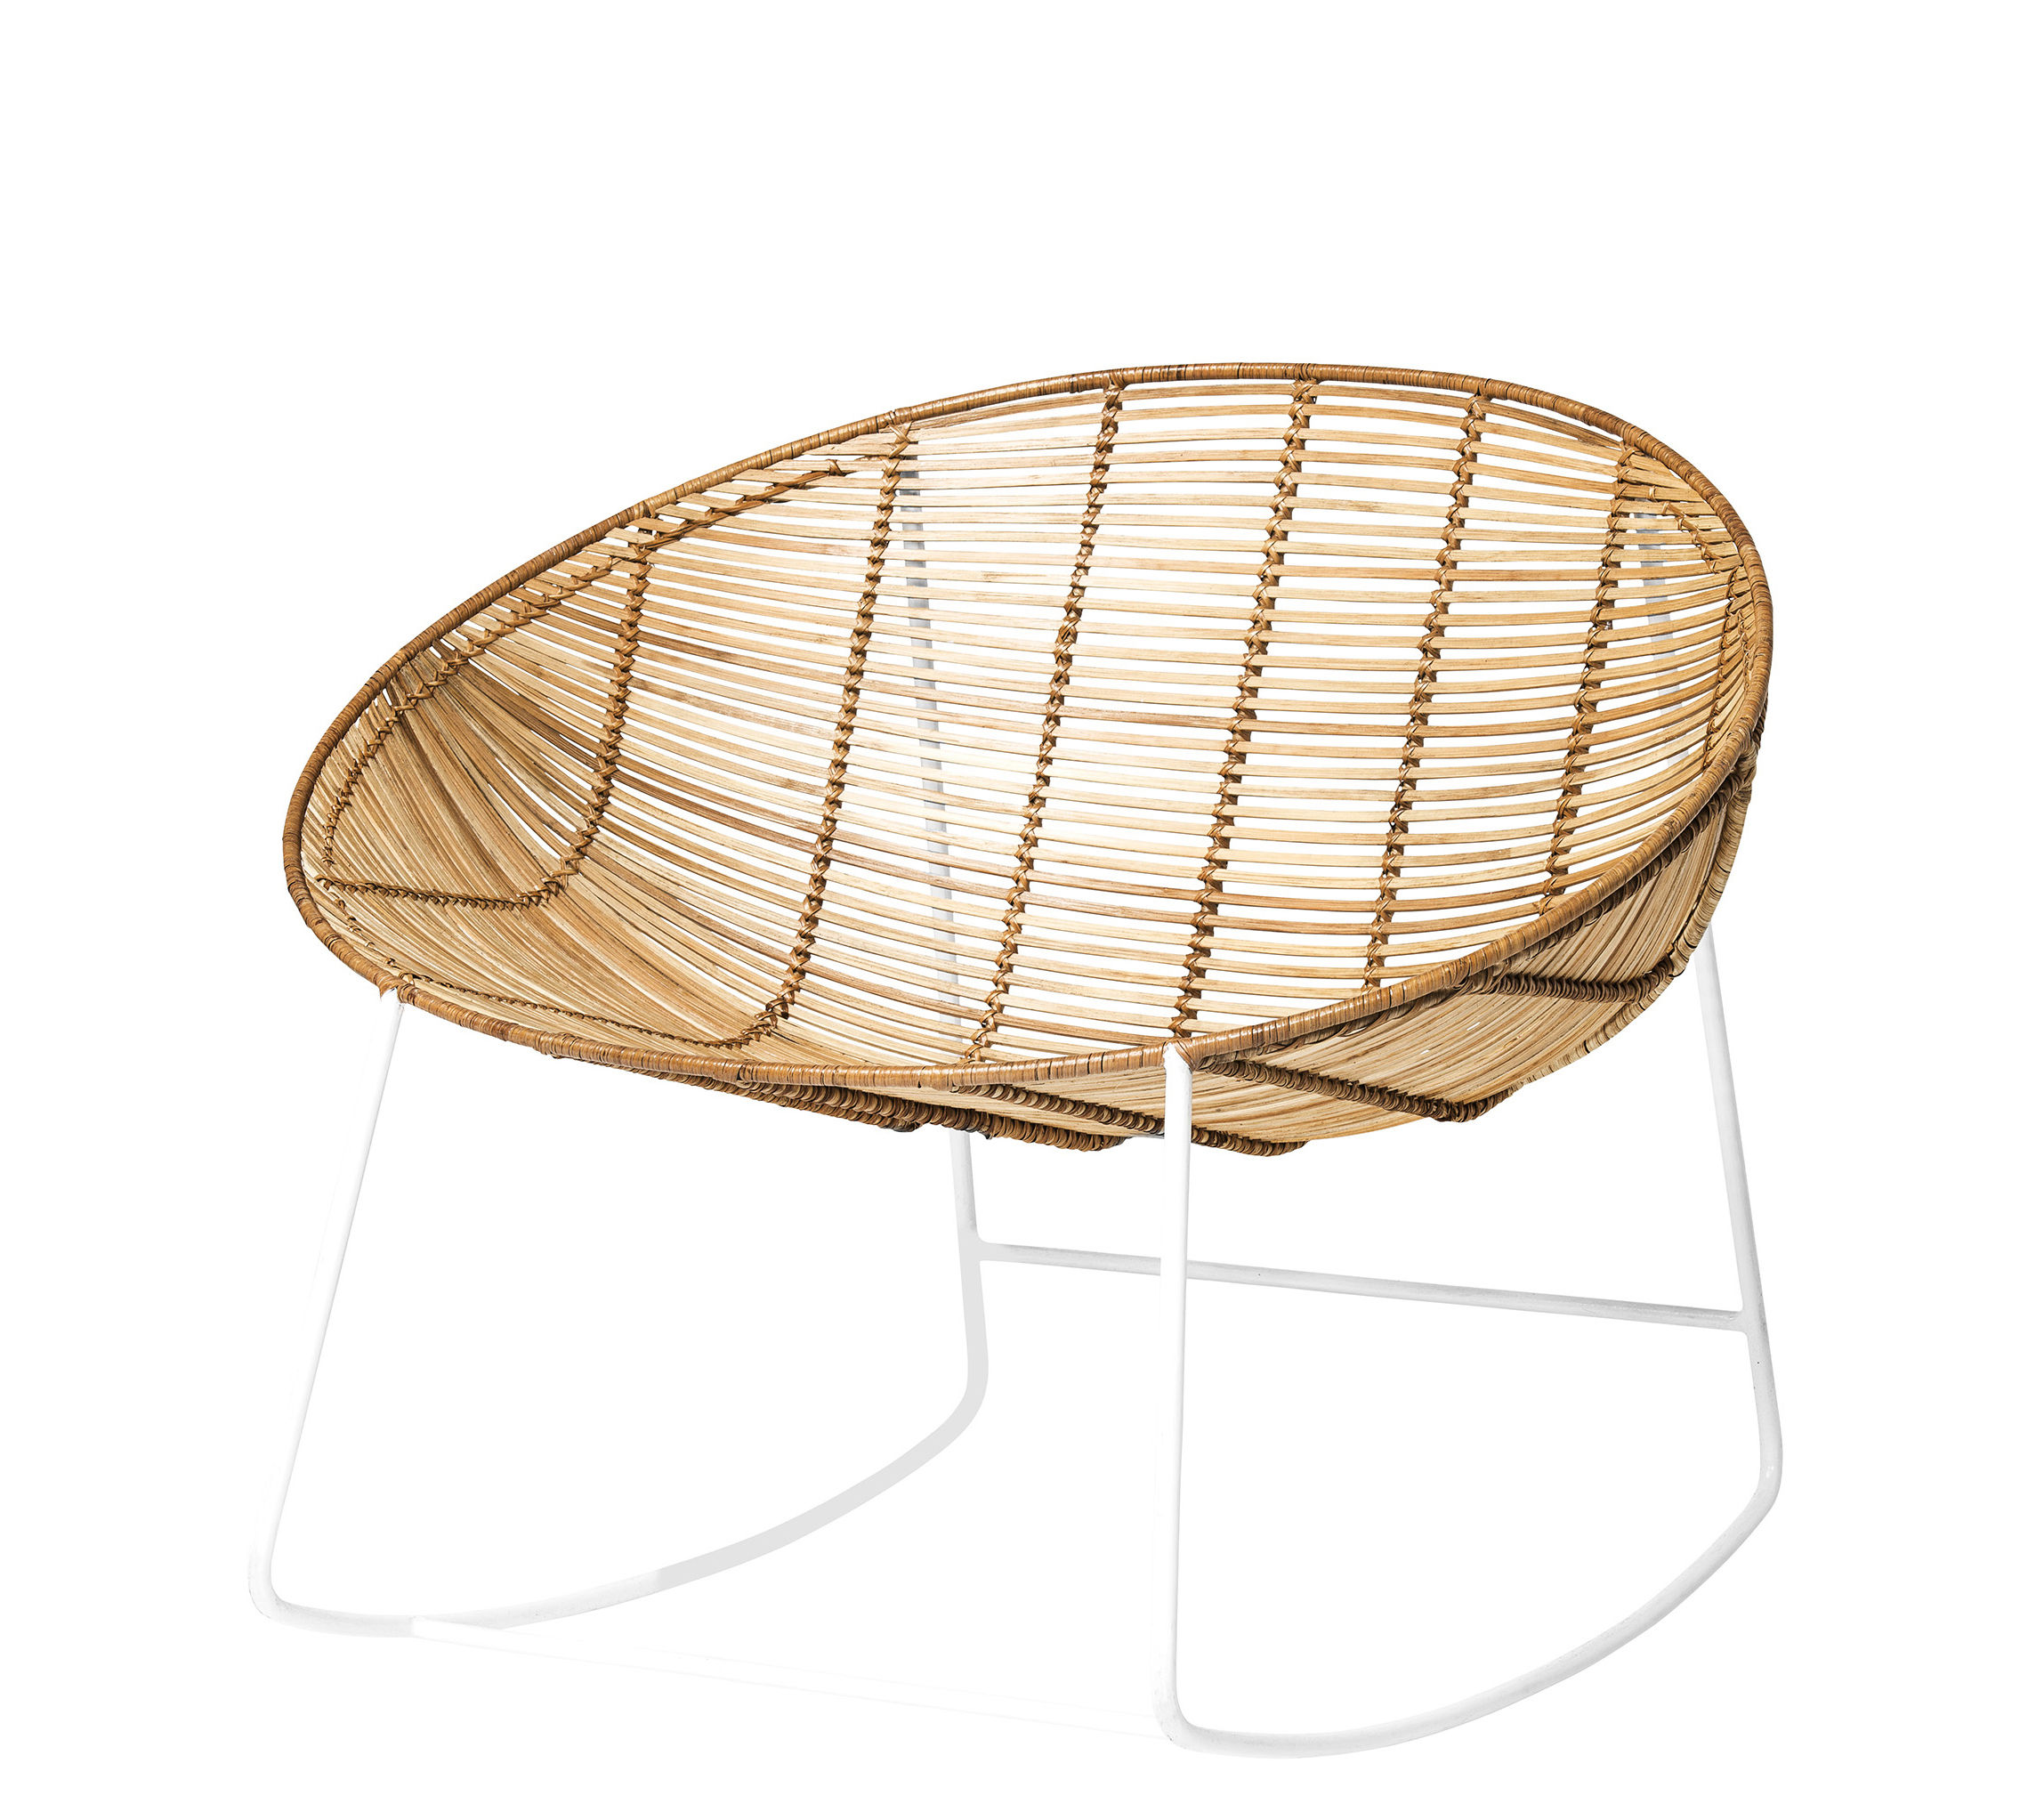 Möbel - Lounge Sessel - Orinoco Schaukelstuhl / Rattan & Metall - Bloomingville - Natur / weiß - lackiertes Metall, Rattan